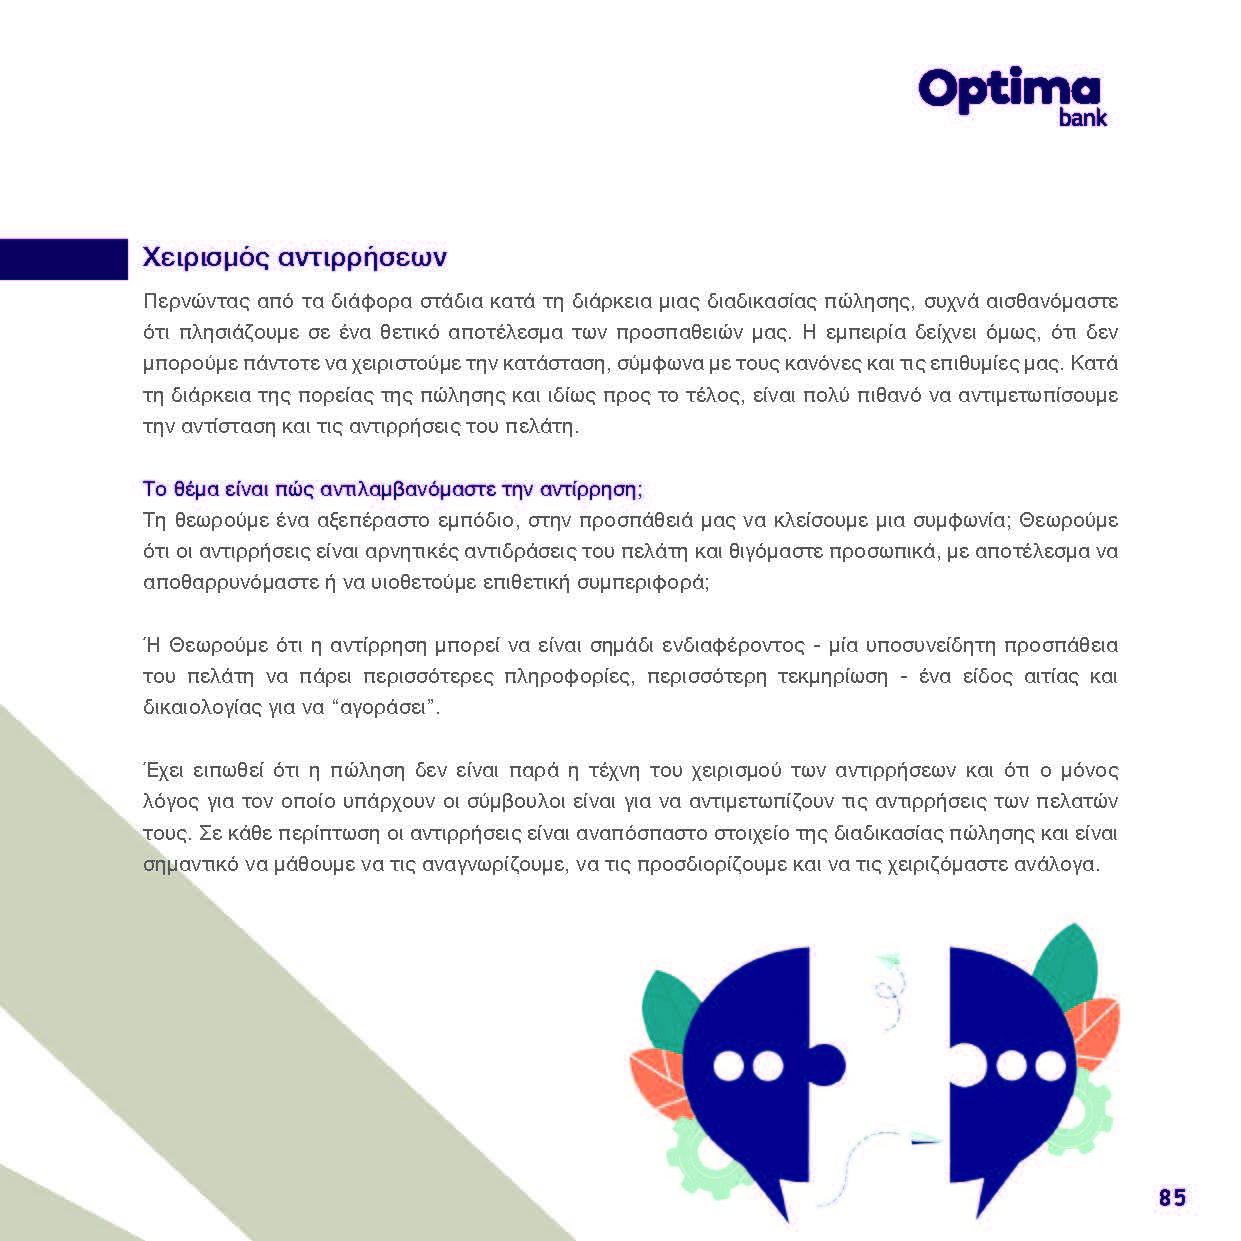 https://www.jib.gr/wp-content/uploads/2020/09/OPTIMA-BANK-BOOKLET-WEB_Page_085.jpg